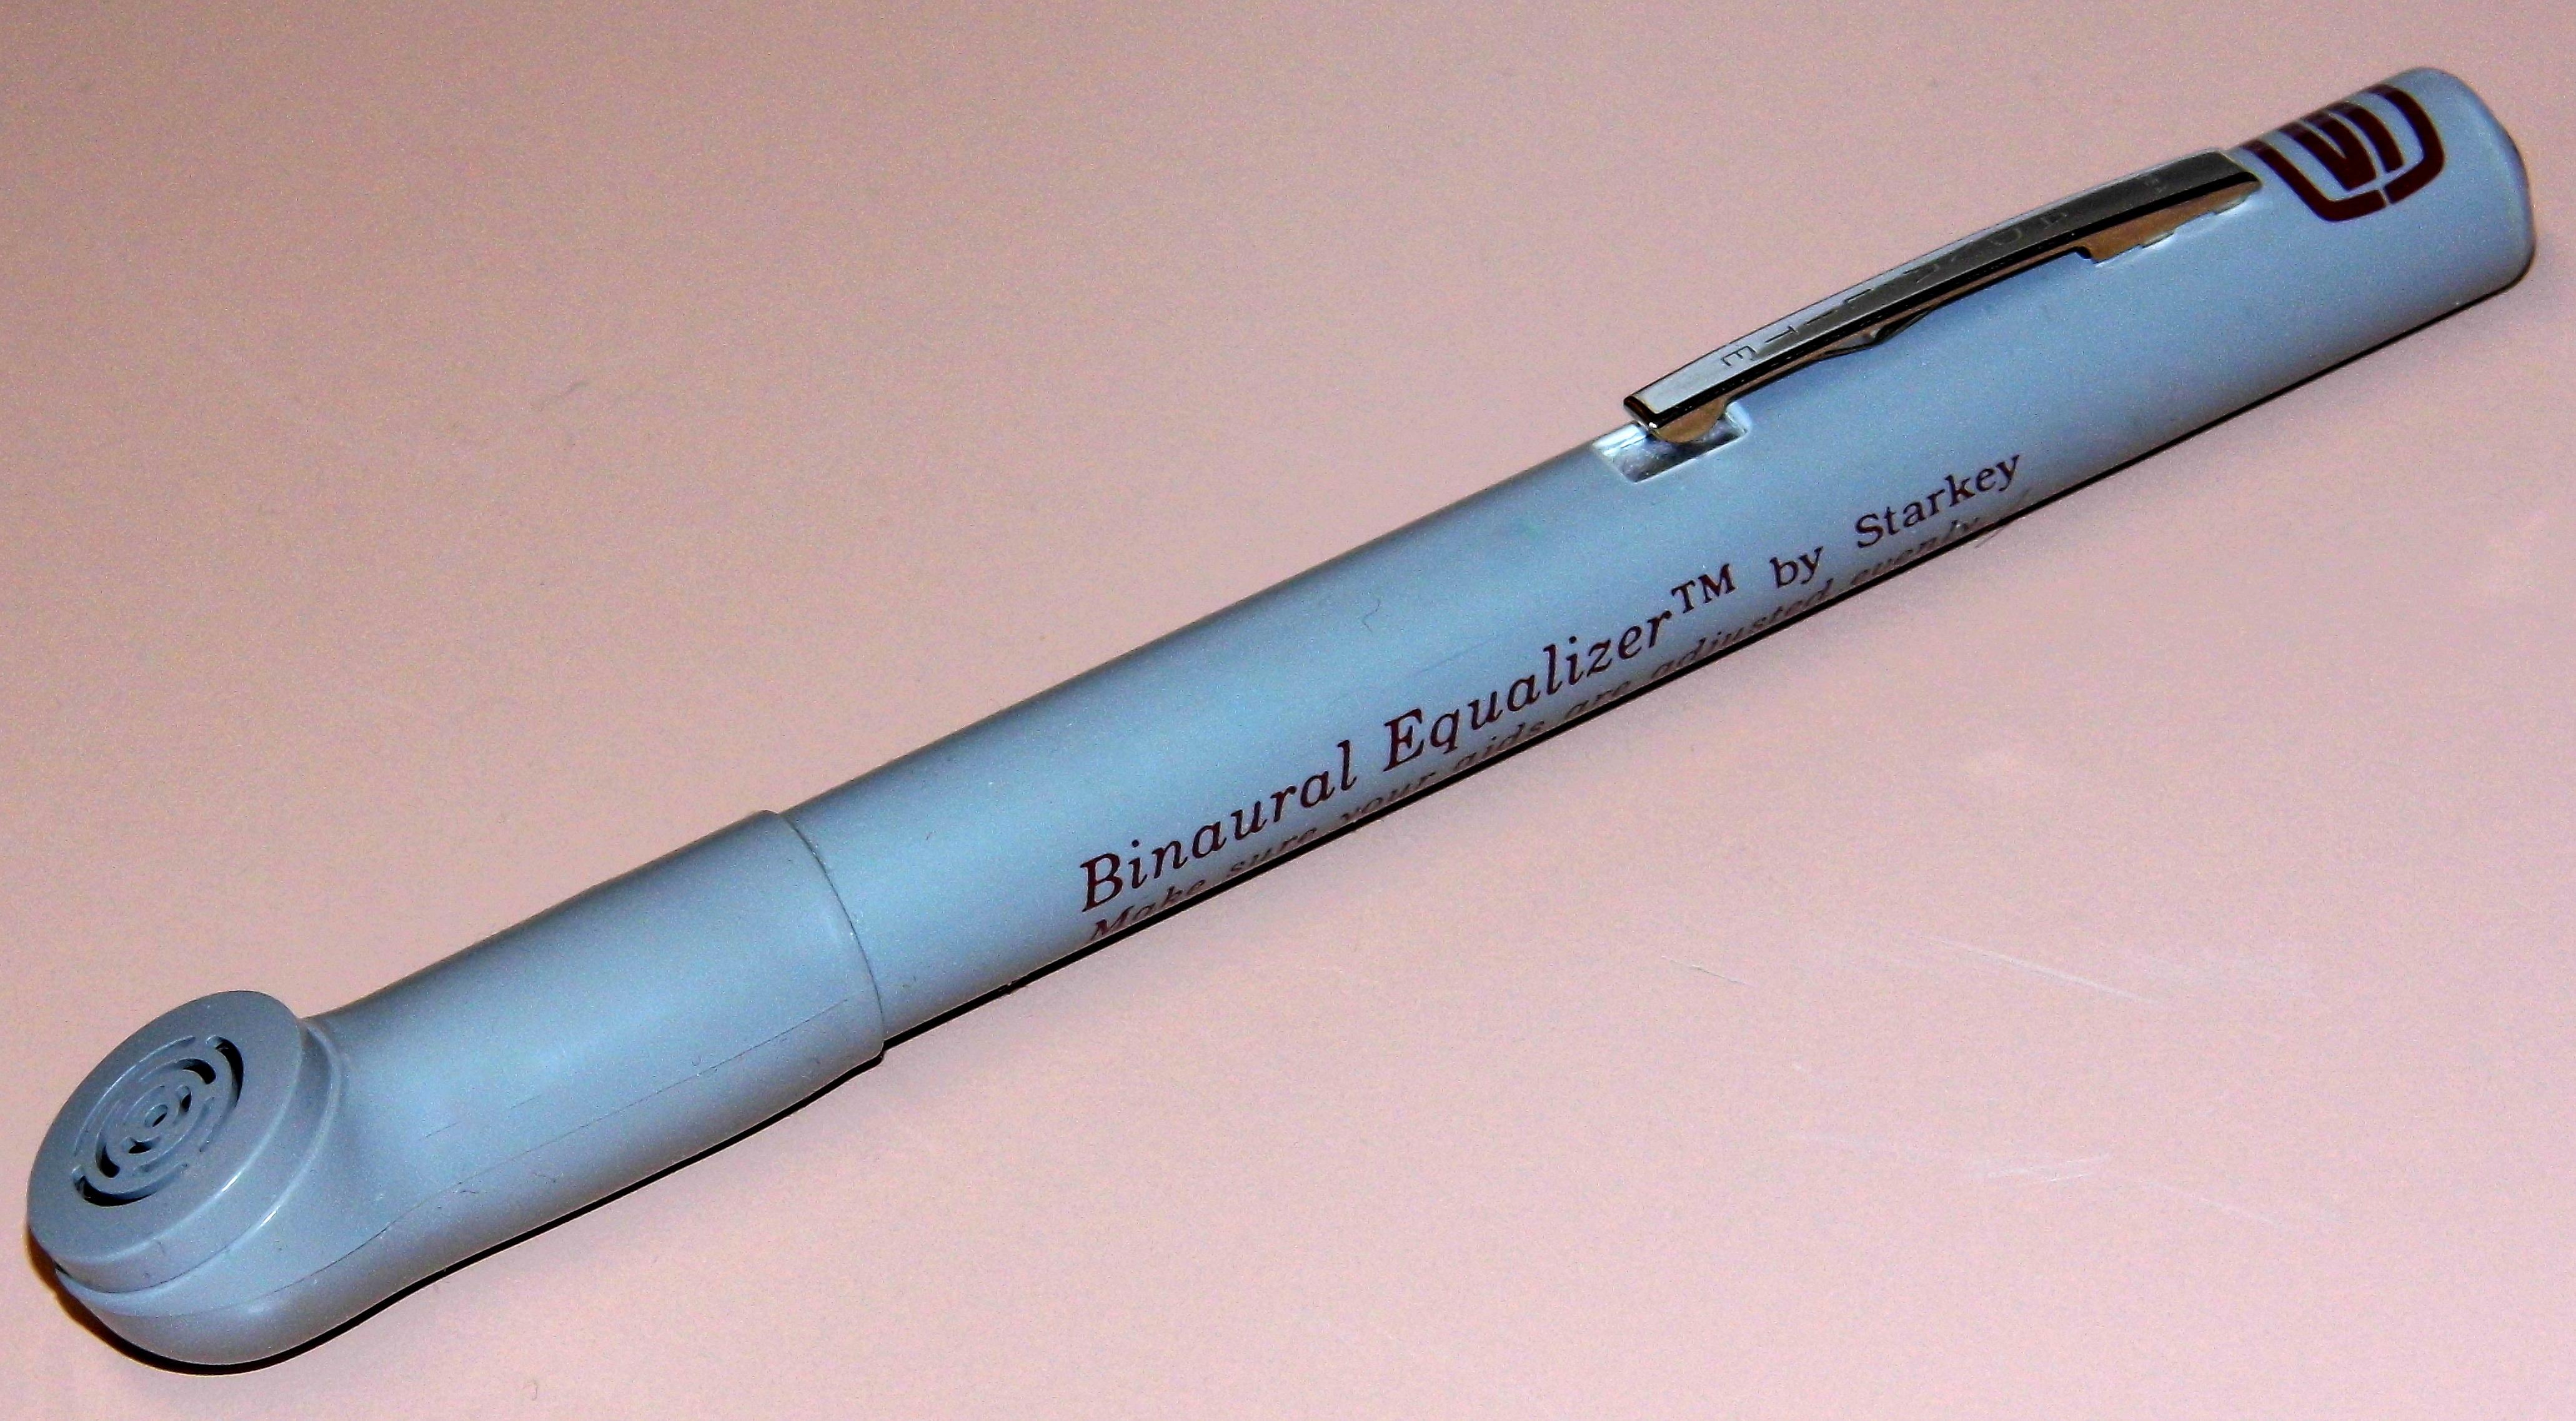 File Vintage Starkey Binaural Equalizer Fountain Pen Size Tone